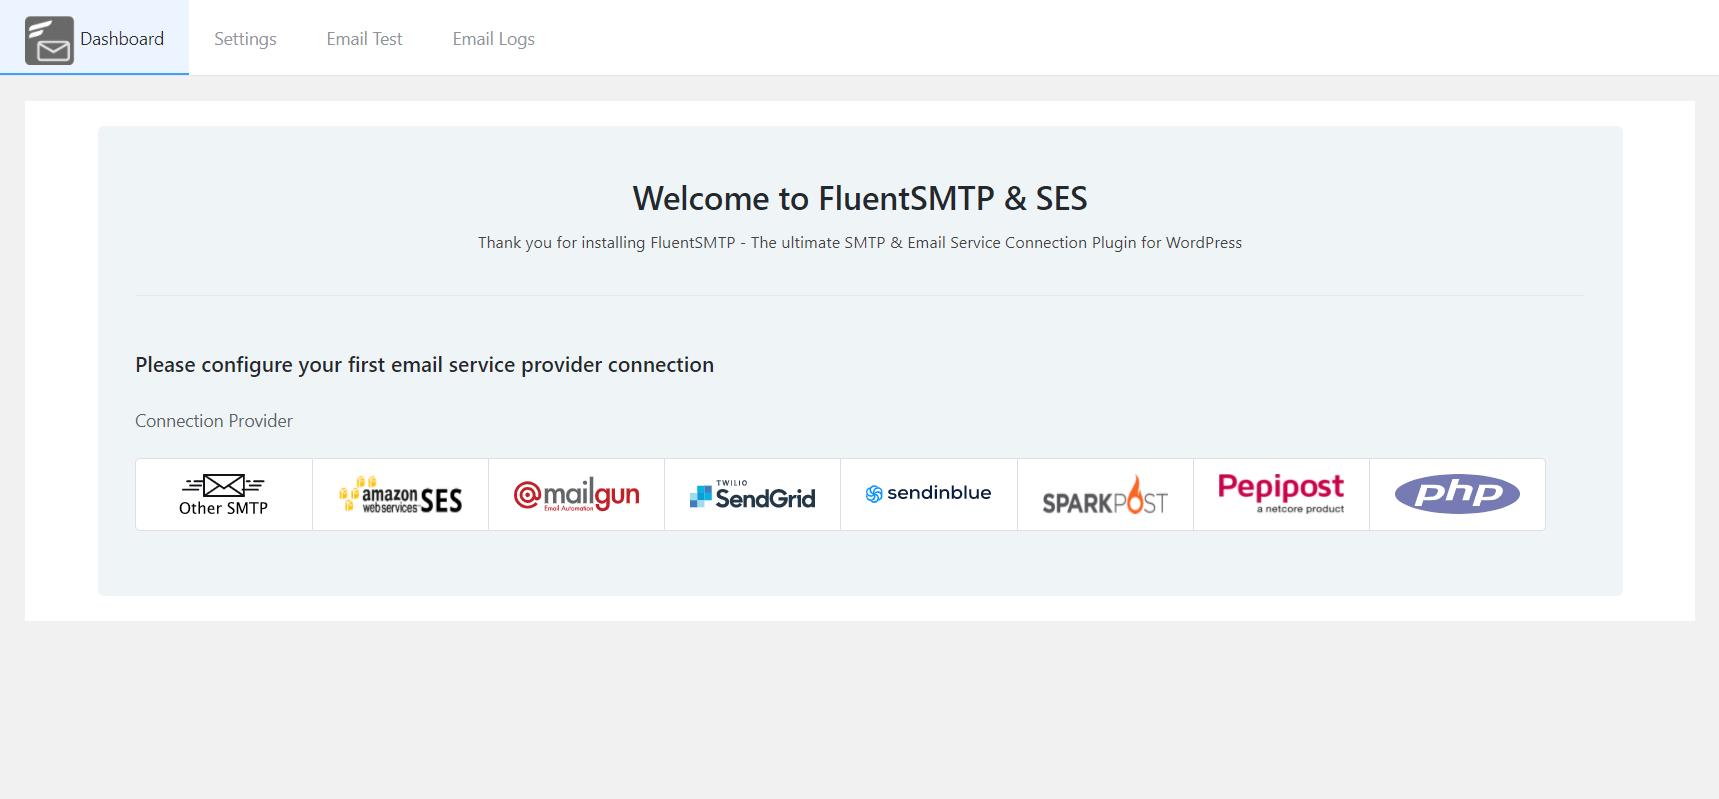 Configuring Fluent SMTP for SendInBlue